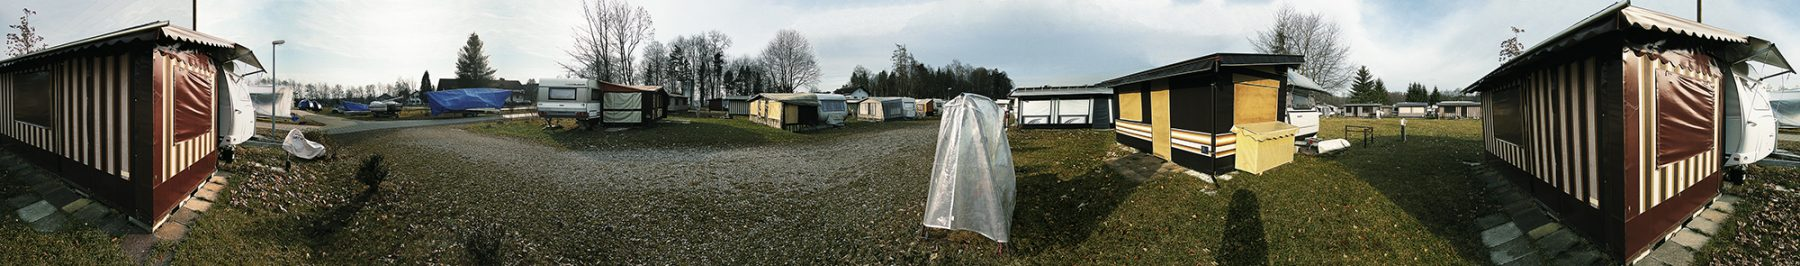 Camping tif